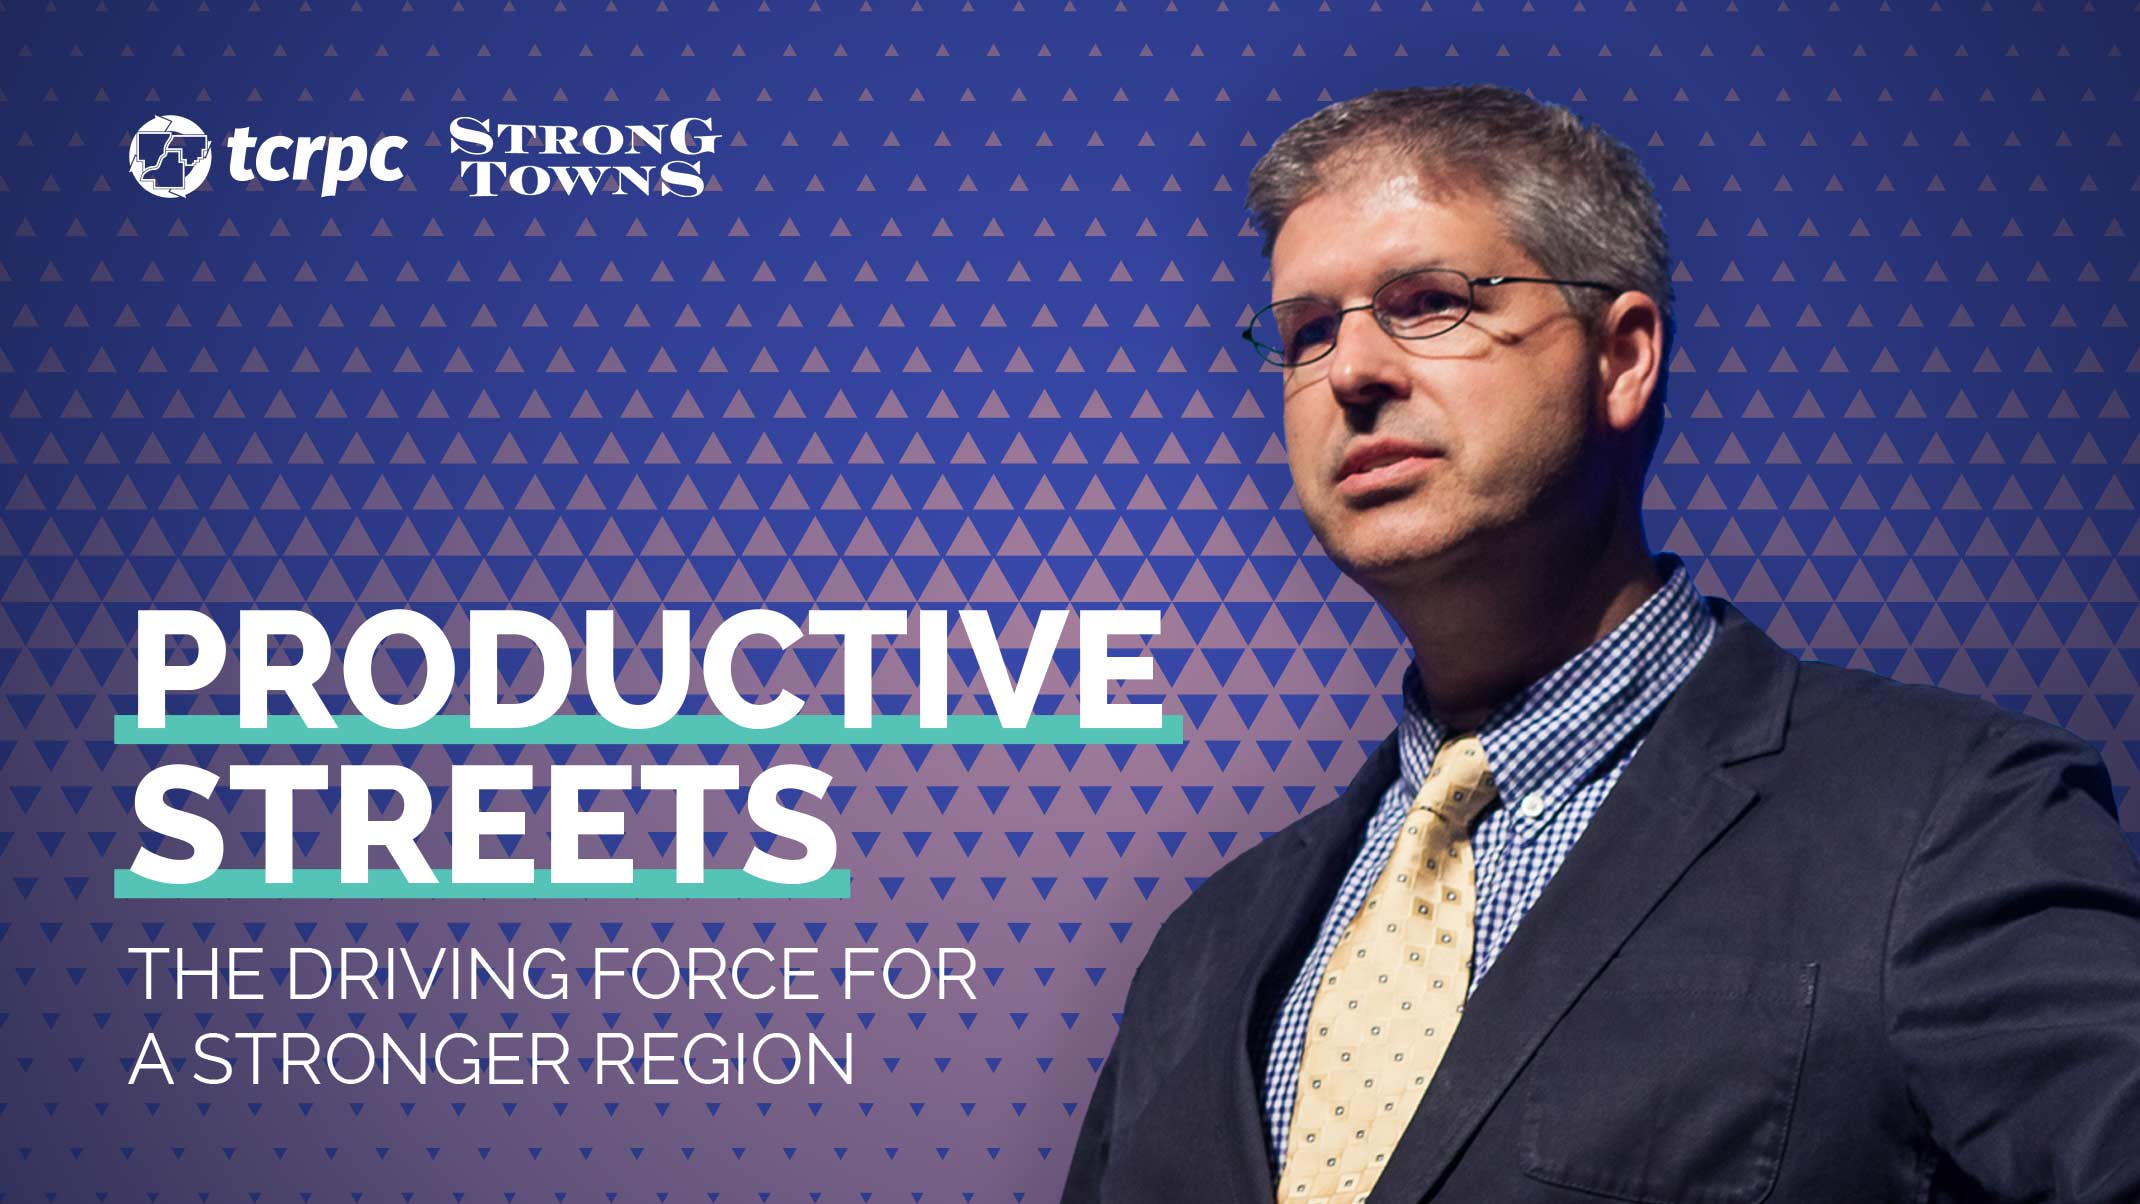 Speaker at transportation seminar: Stop building new infrastructure